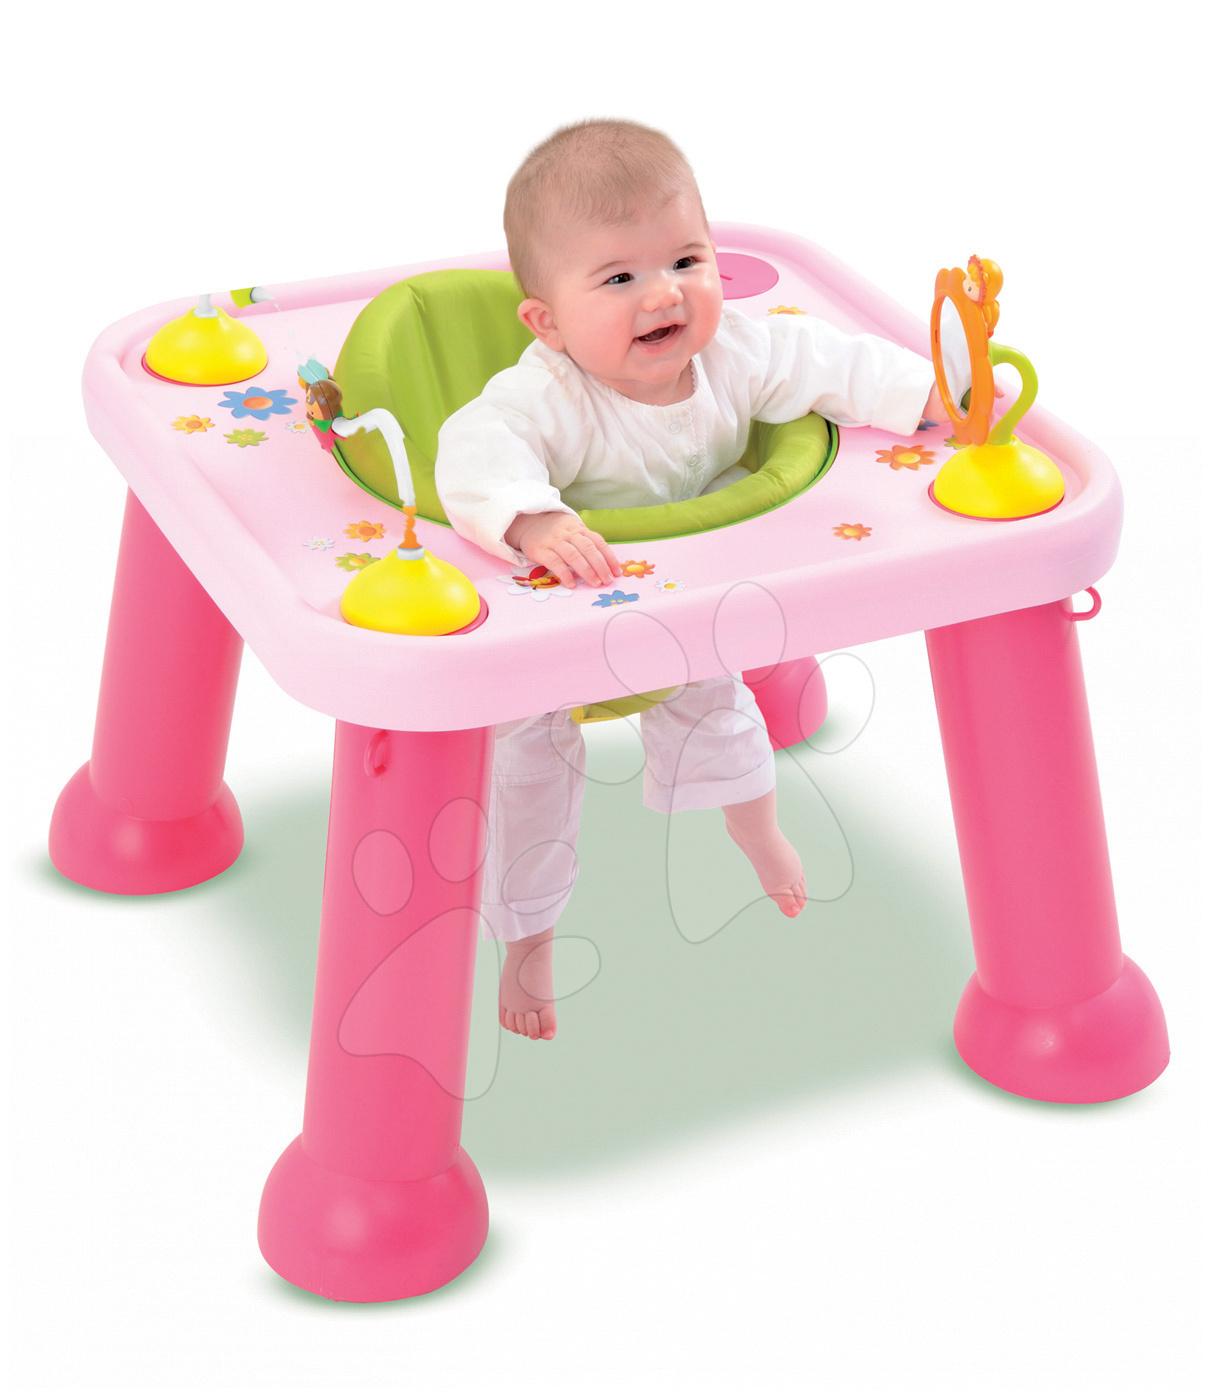 Interaktívne hudobné stoly - Stolík Cotoons Youpi Smoby s hračkami ružový od 6 mes